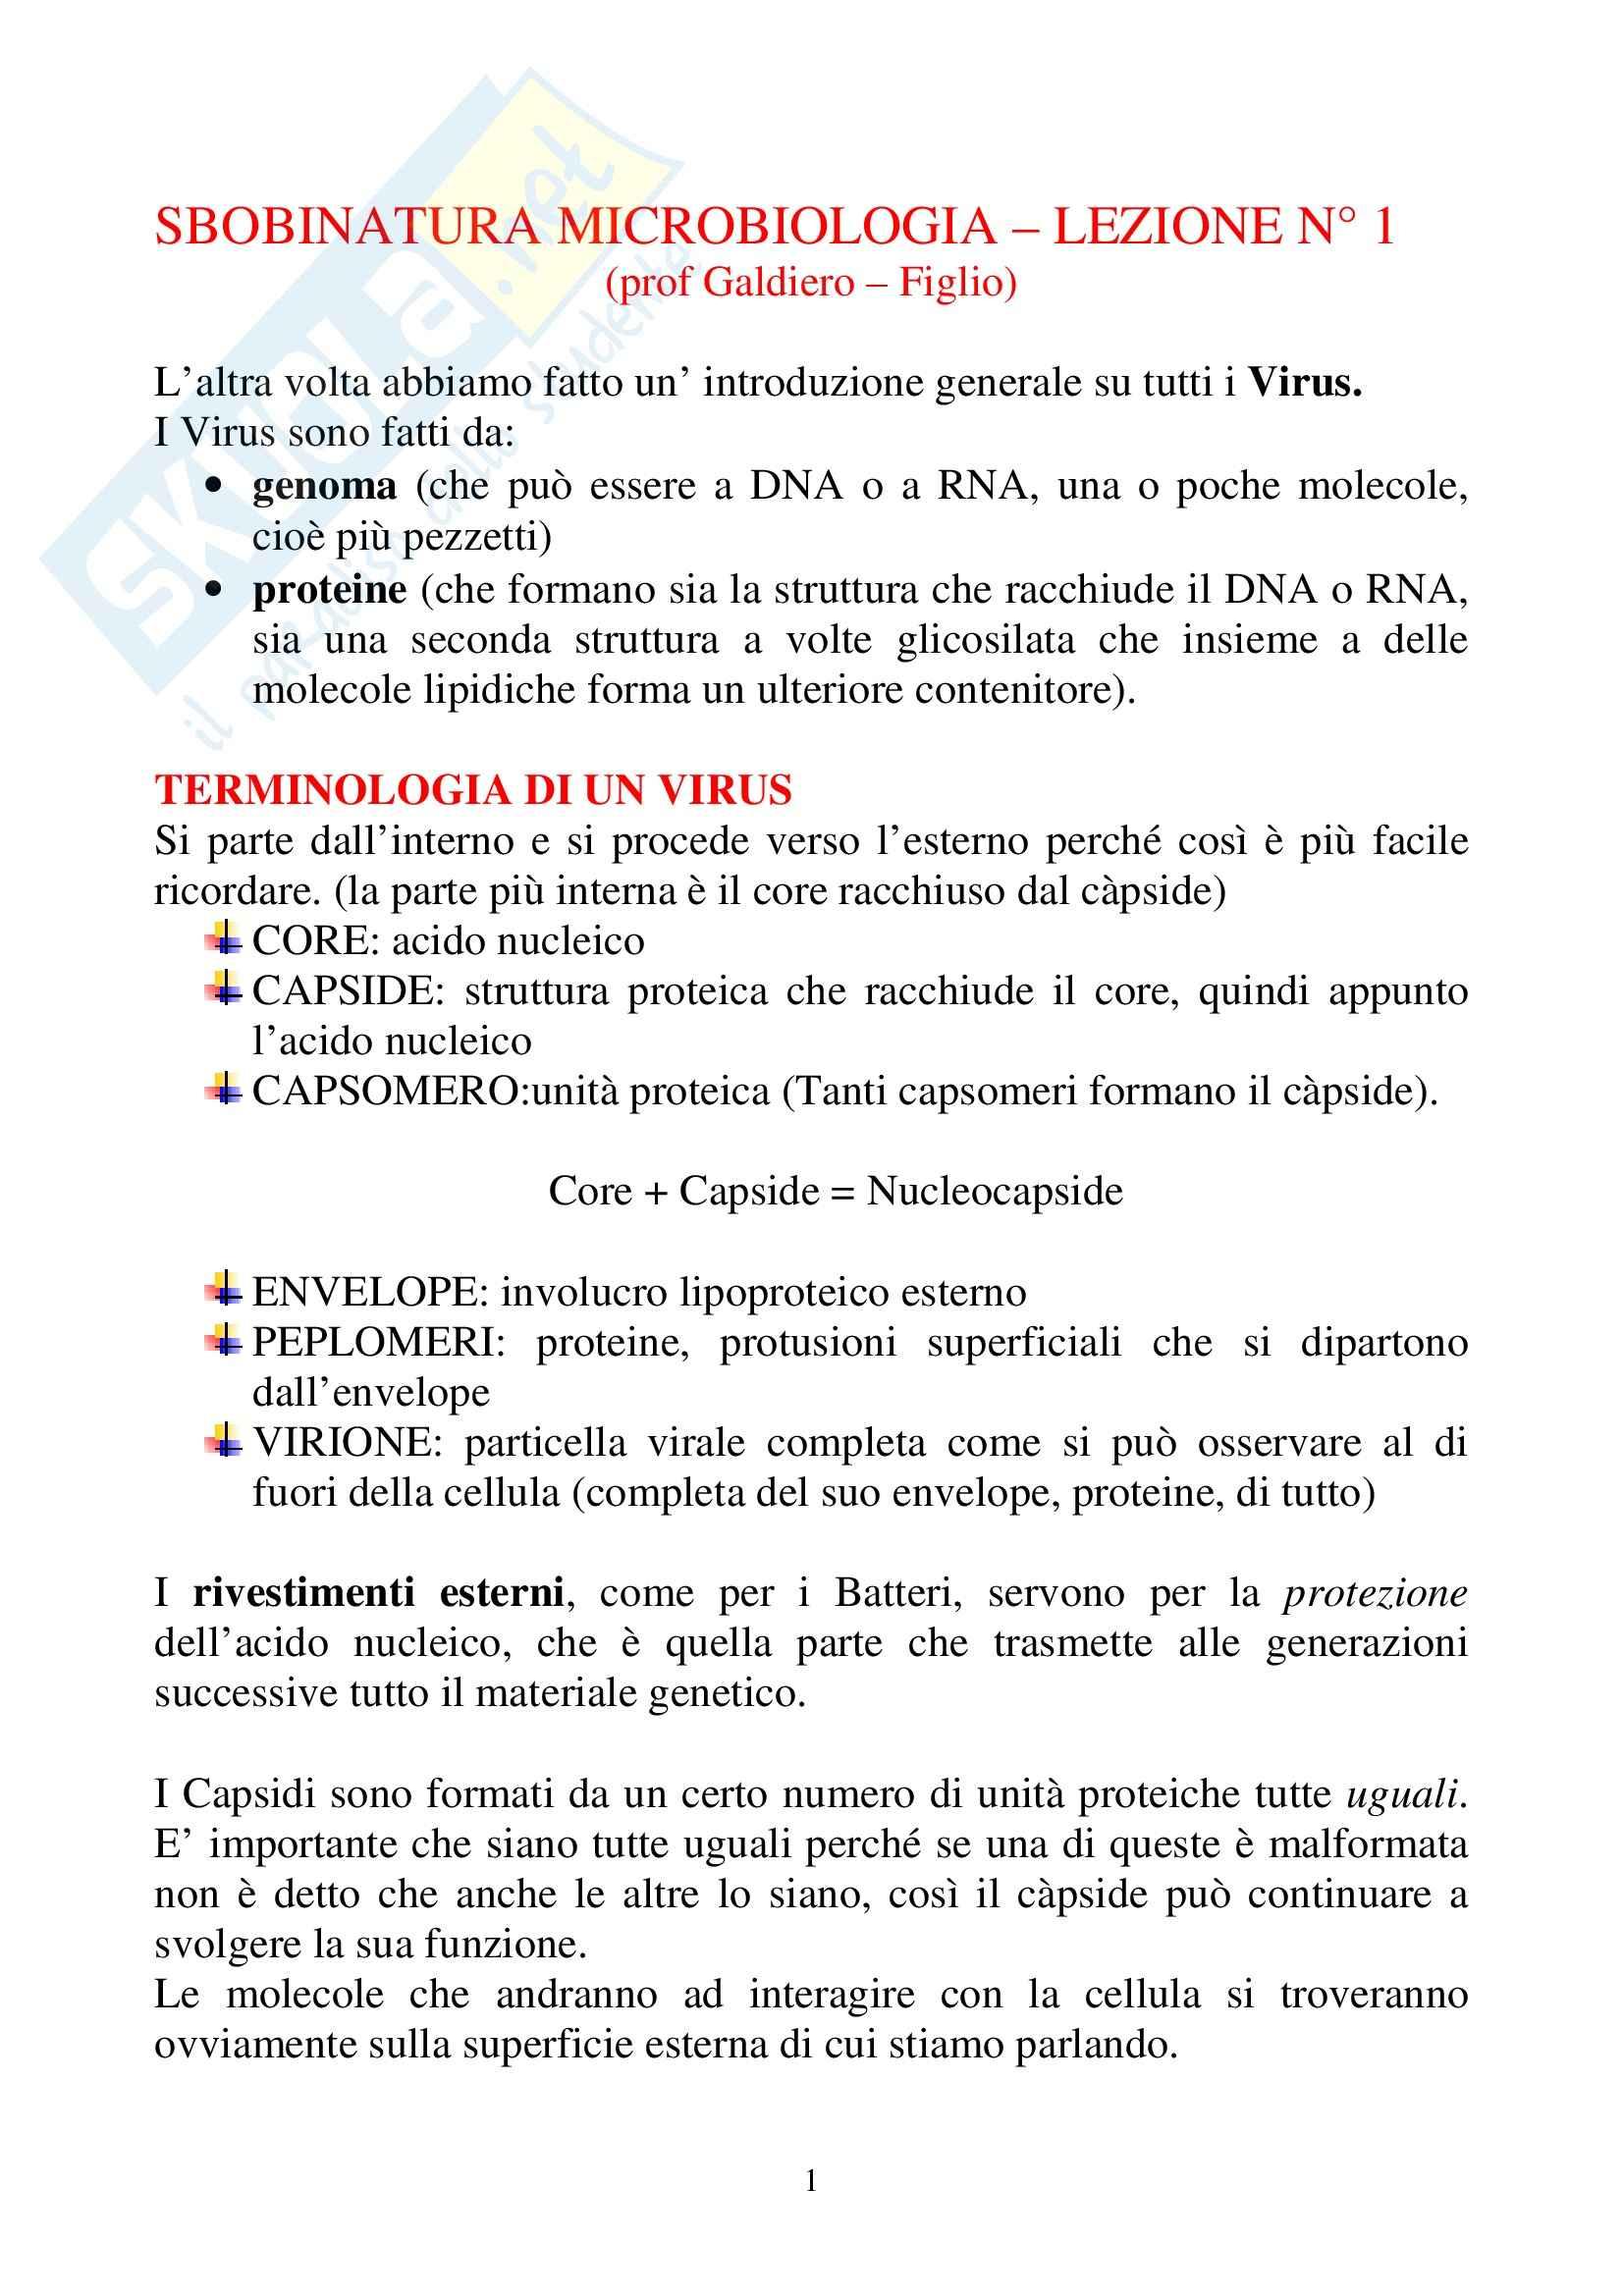 Microbiologia - virus